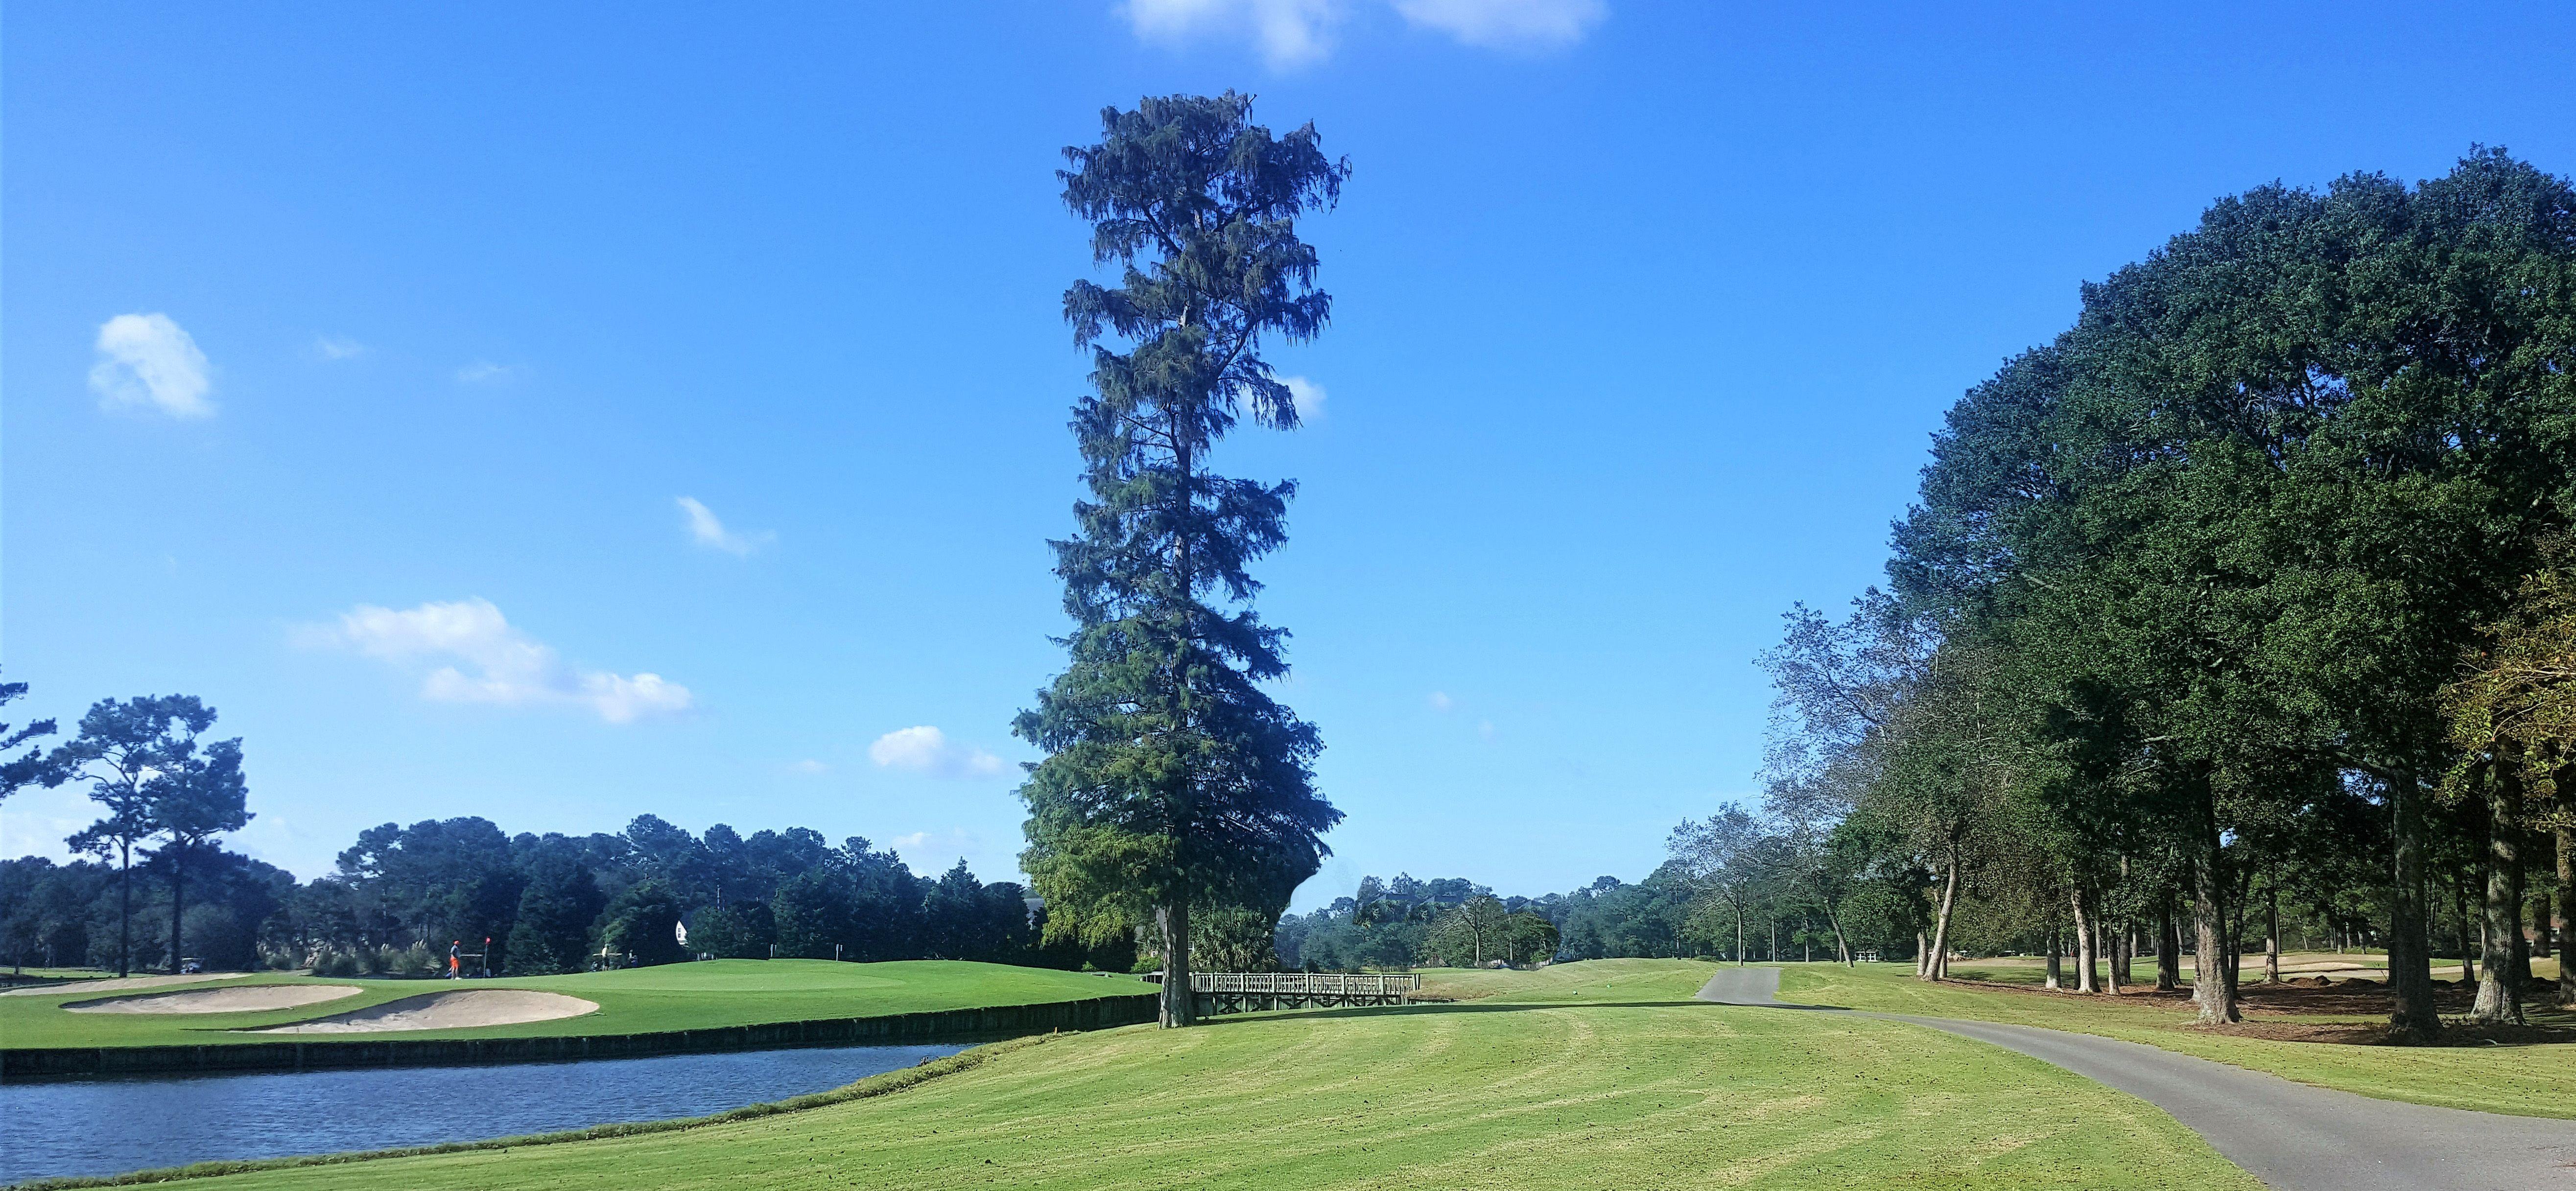 Pin on Golf Getaways